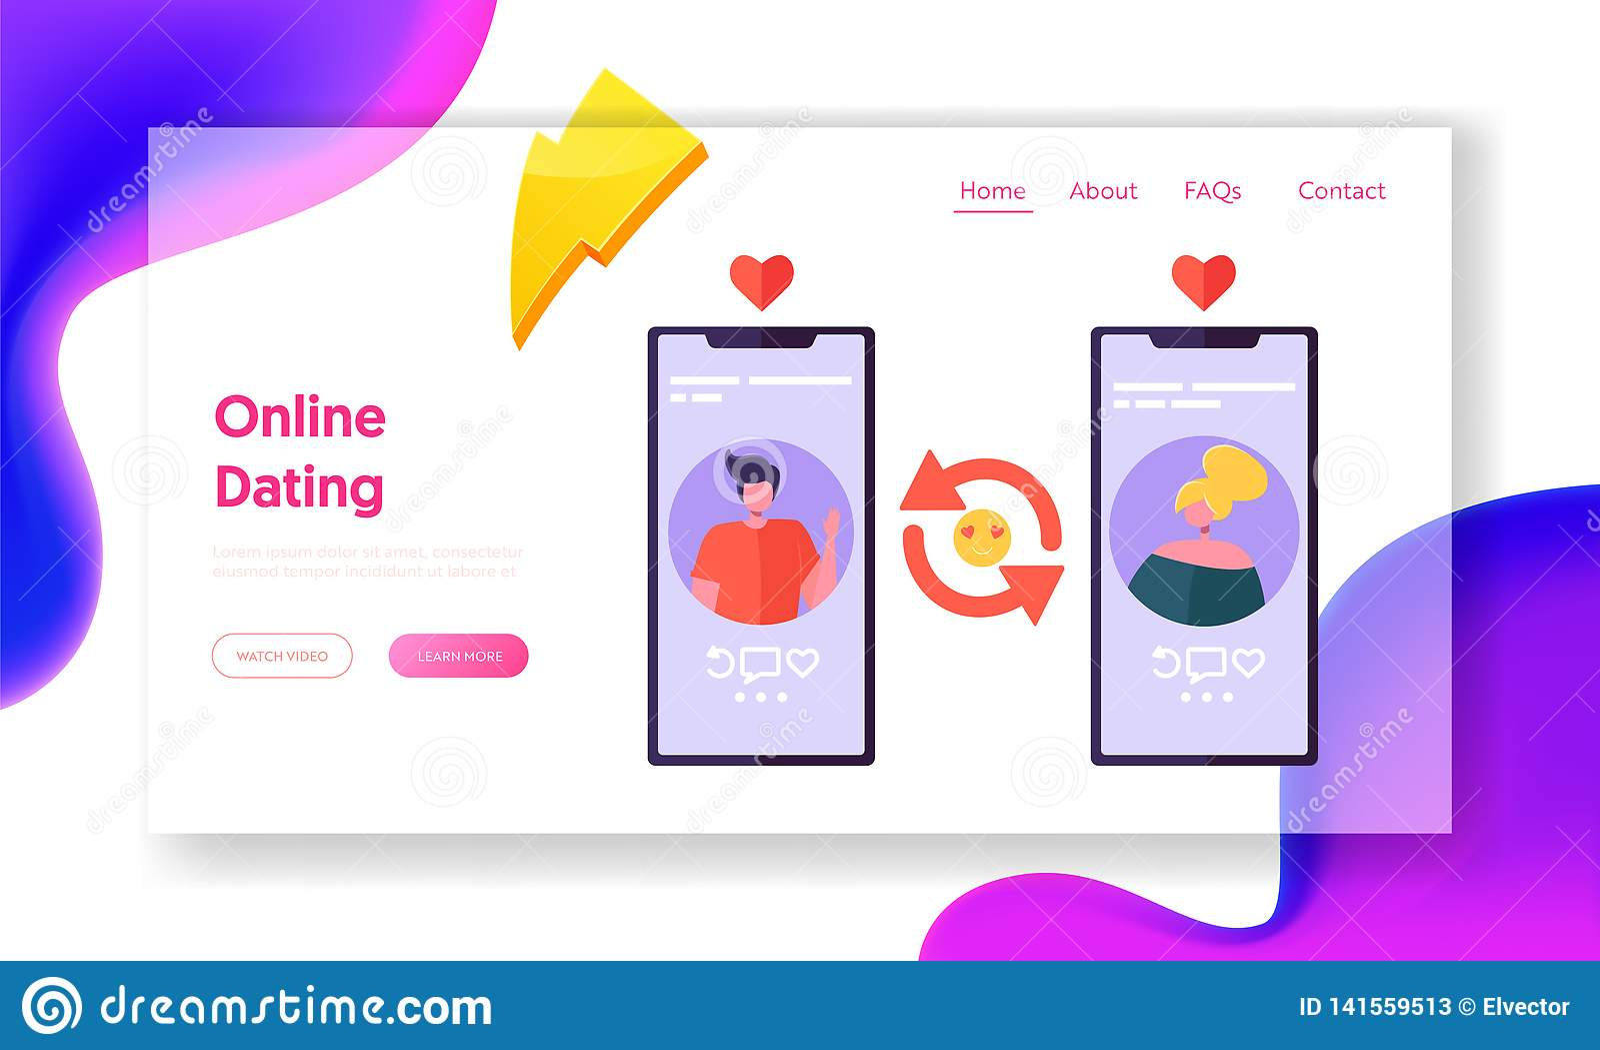 use of online dating websites